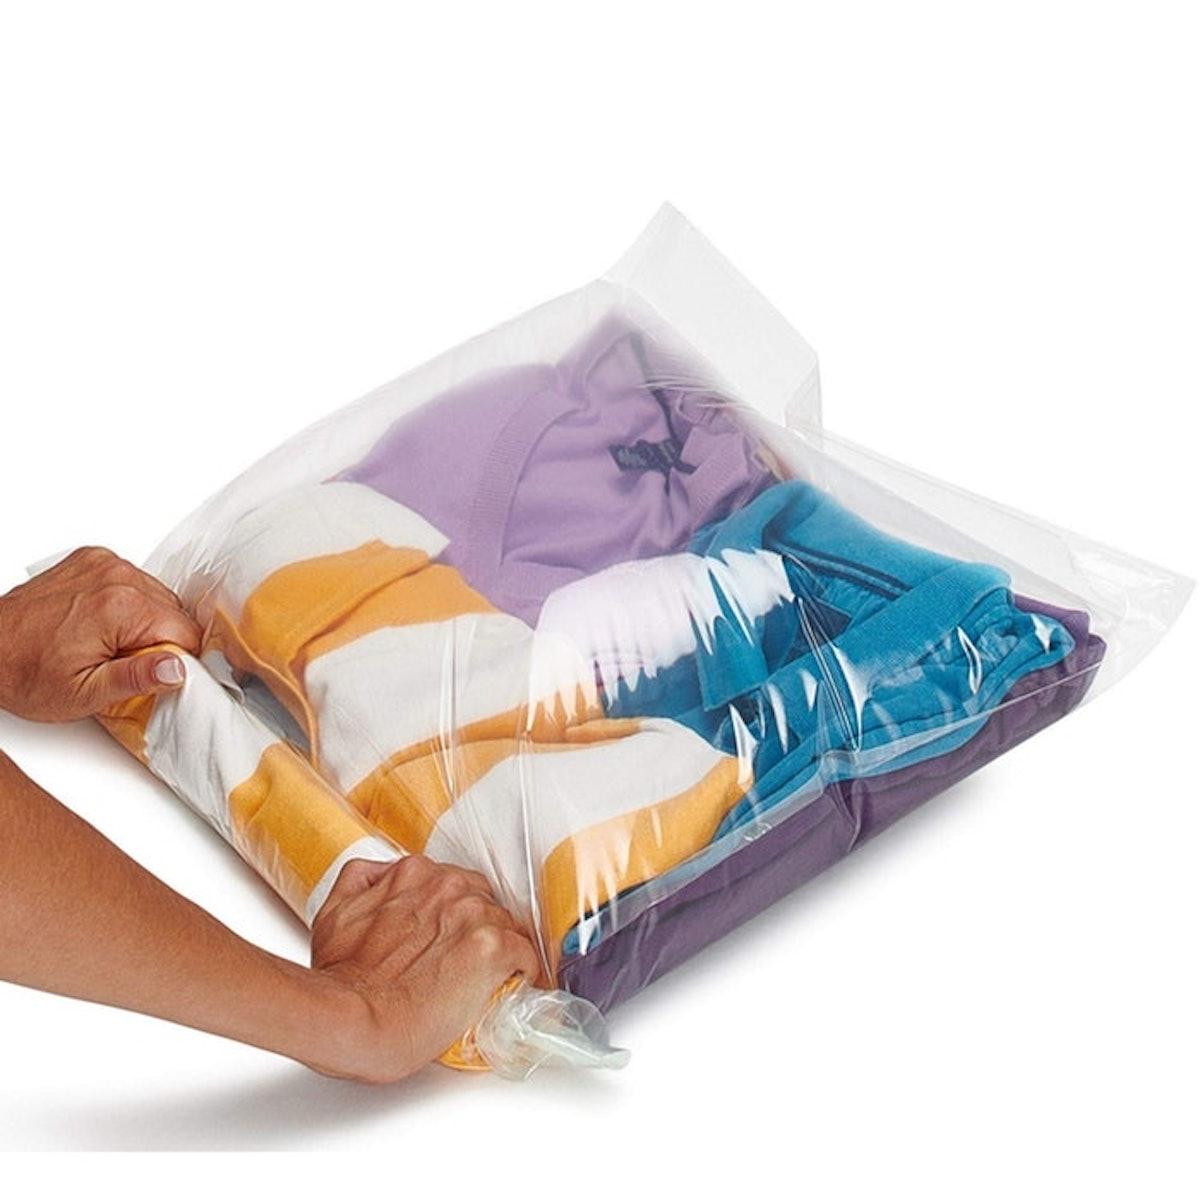 Lekors Travel Space Saver Bags (10 Pack)